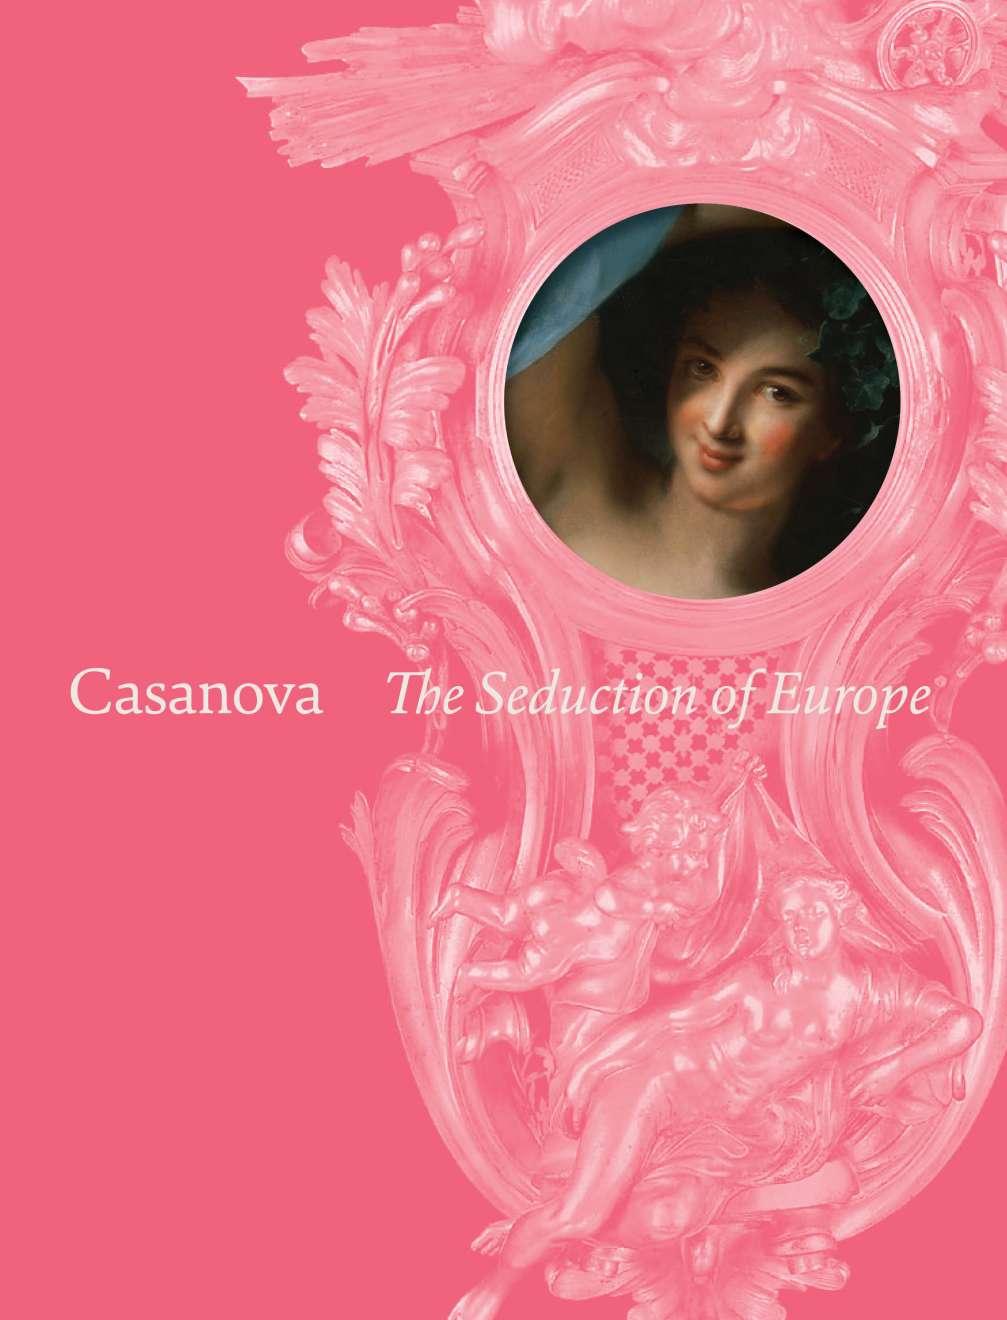 casanova the art of seduction